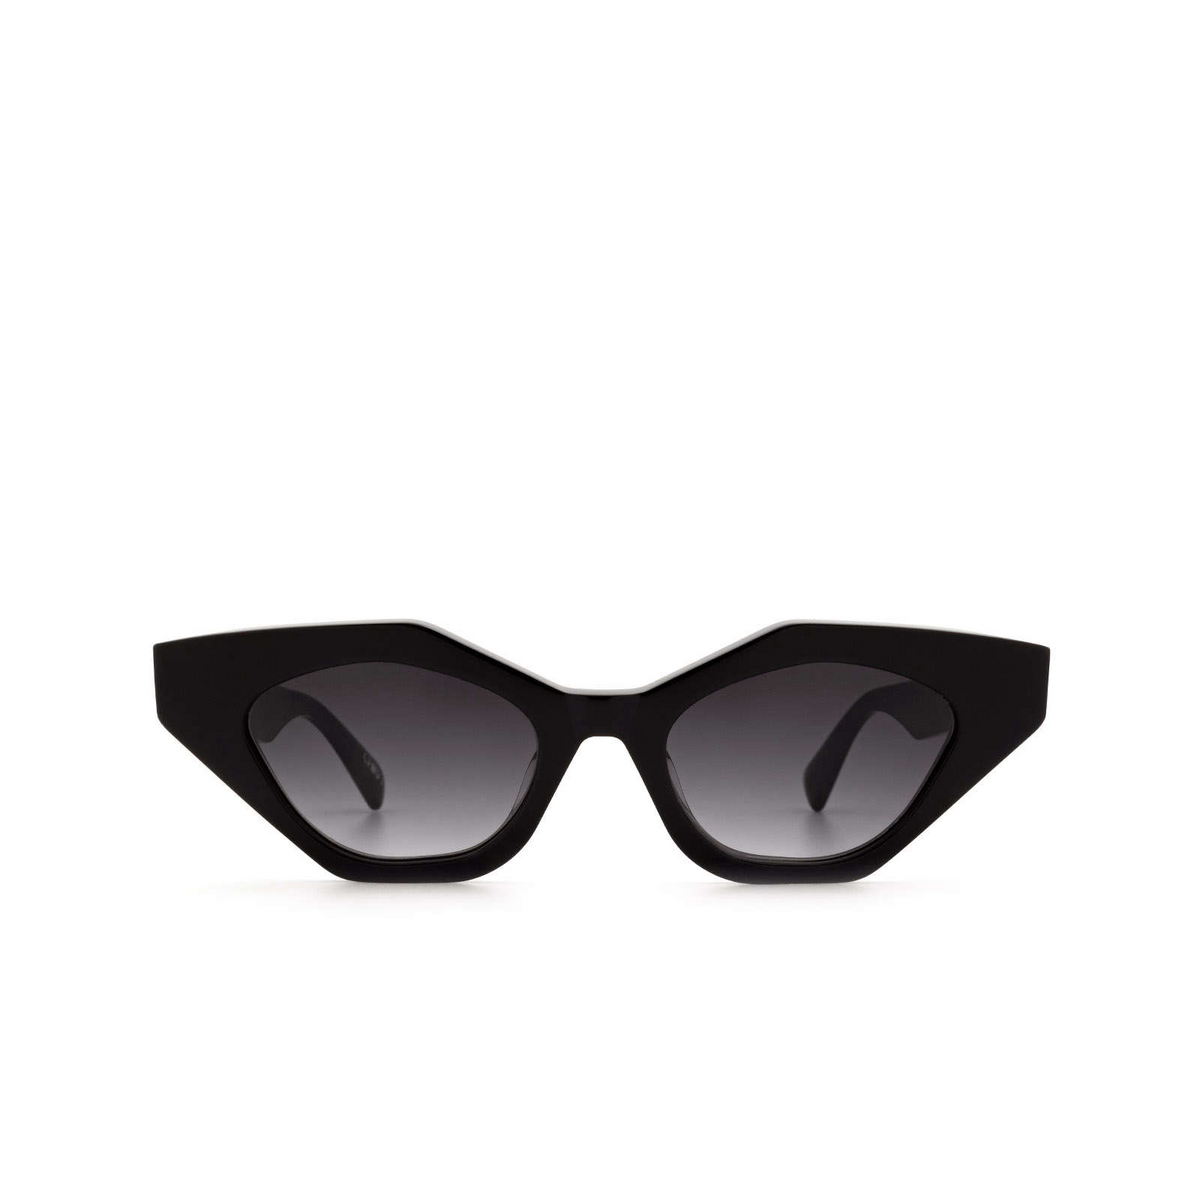 Chimi® Cat-eye Sunglasses: Star Cluster color Black Night.